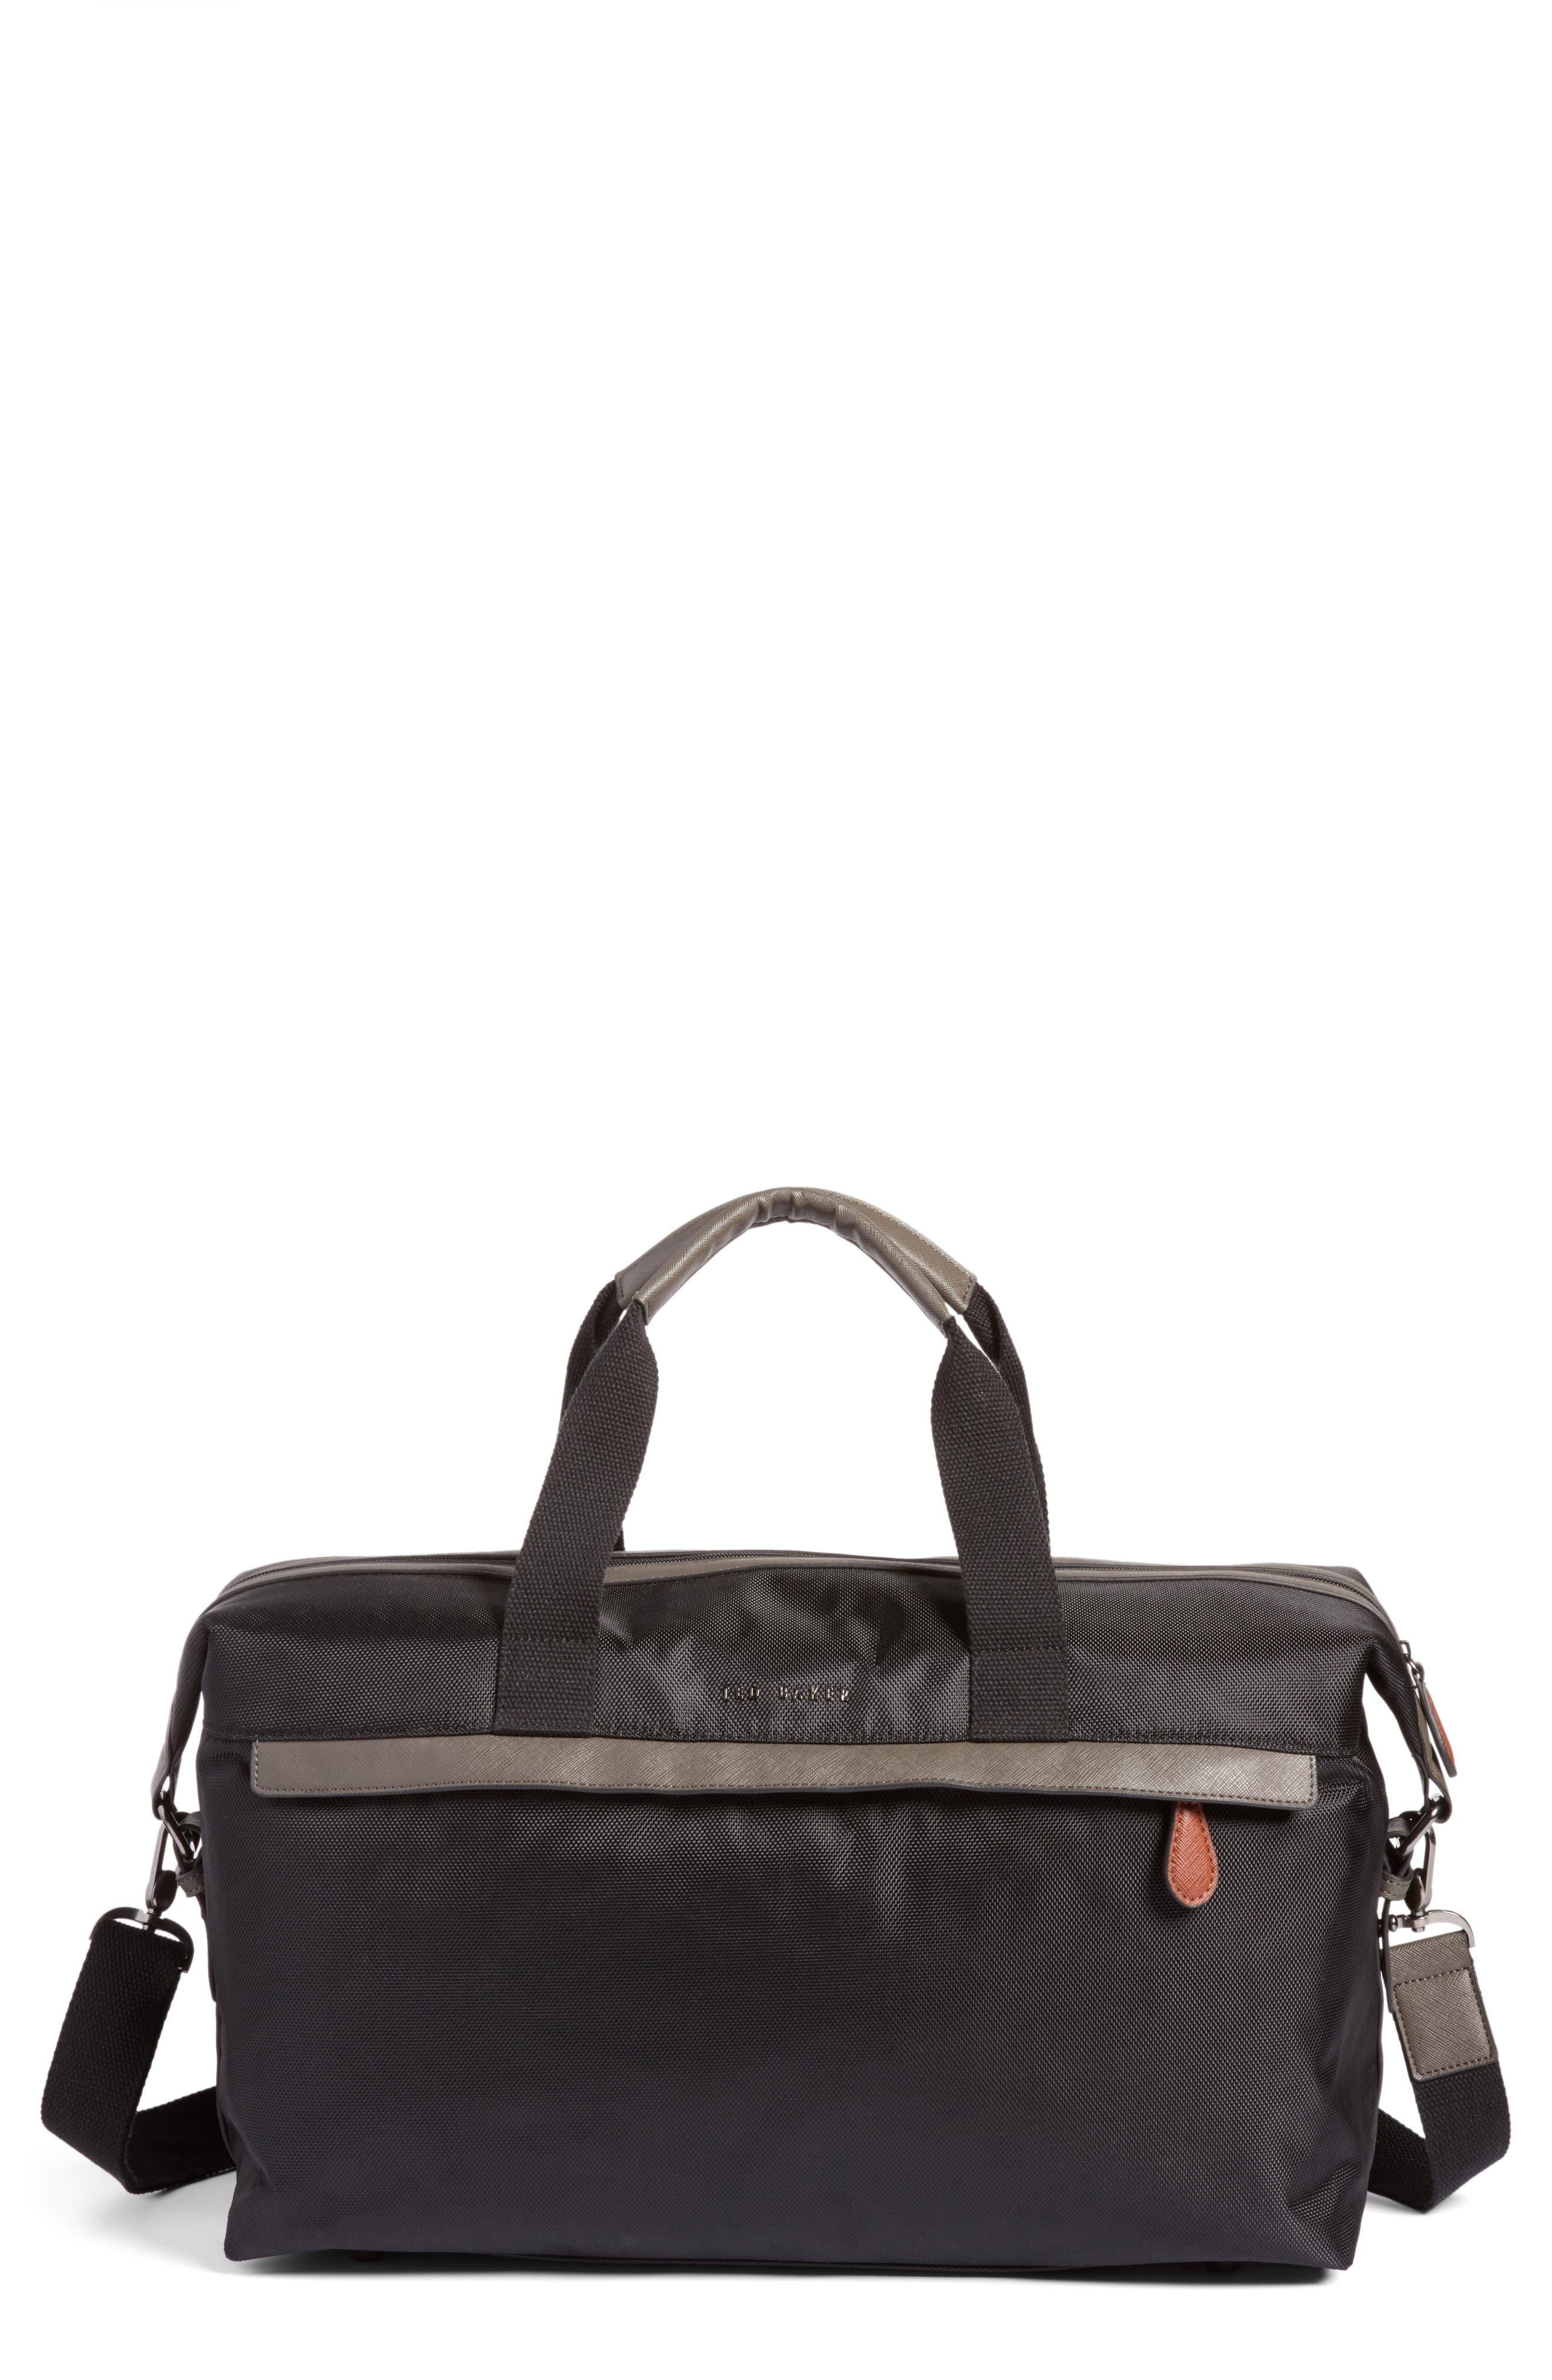 Zeebee Duffel Bag,                             Main thumbnail 1, color,                             Black